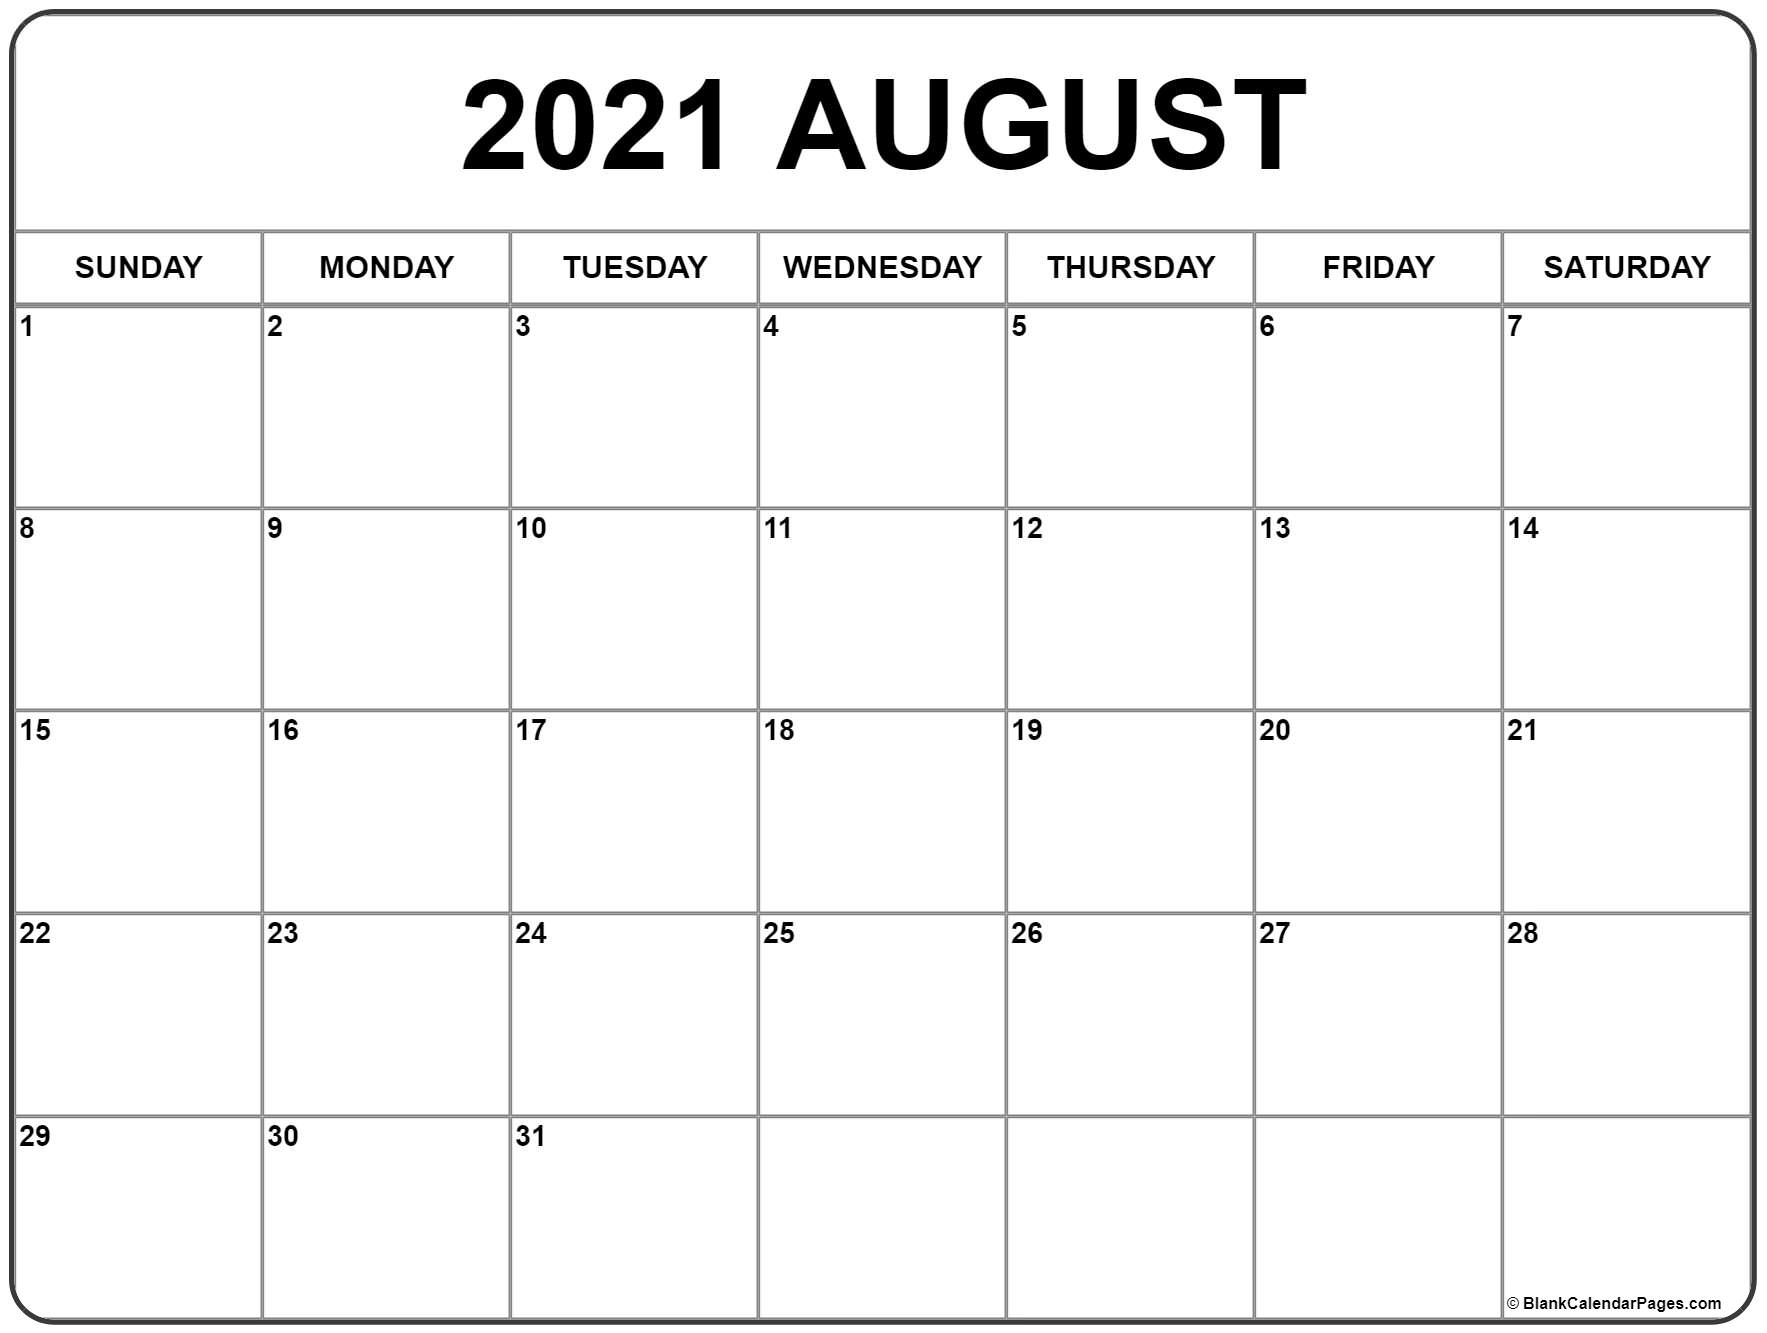 Take August 2021 Calendar Printable Free